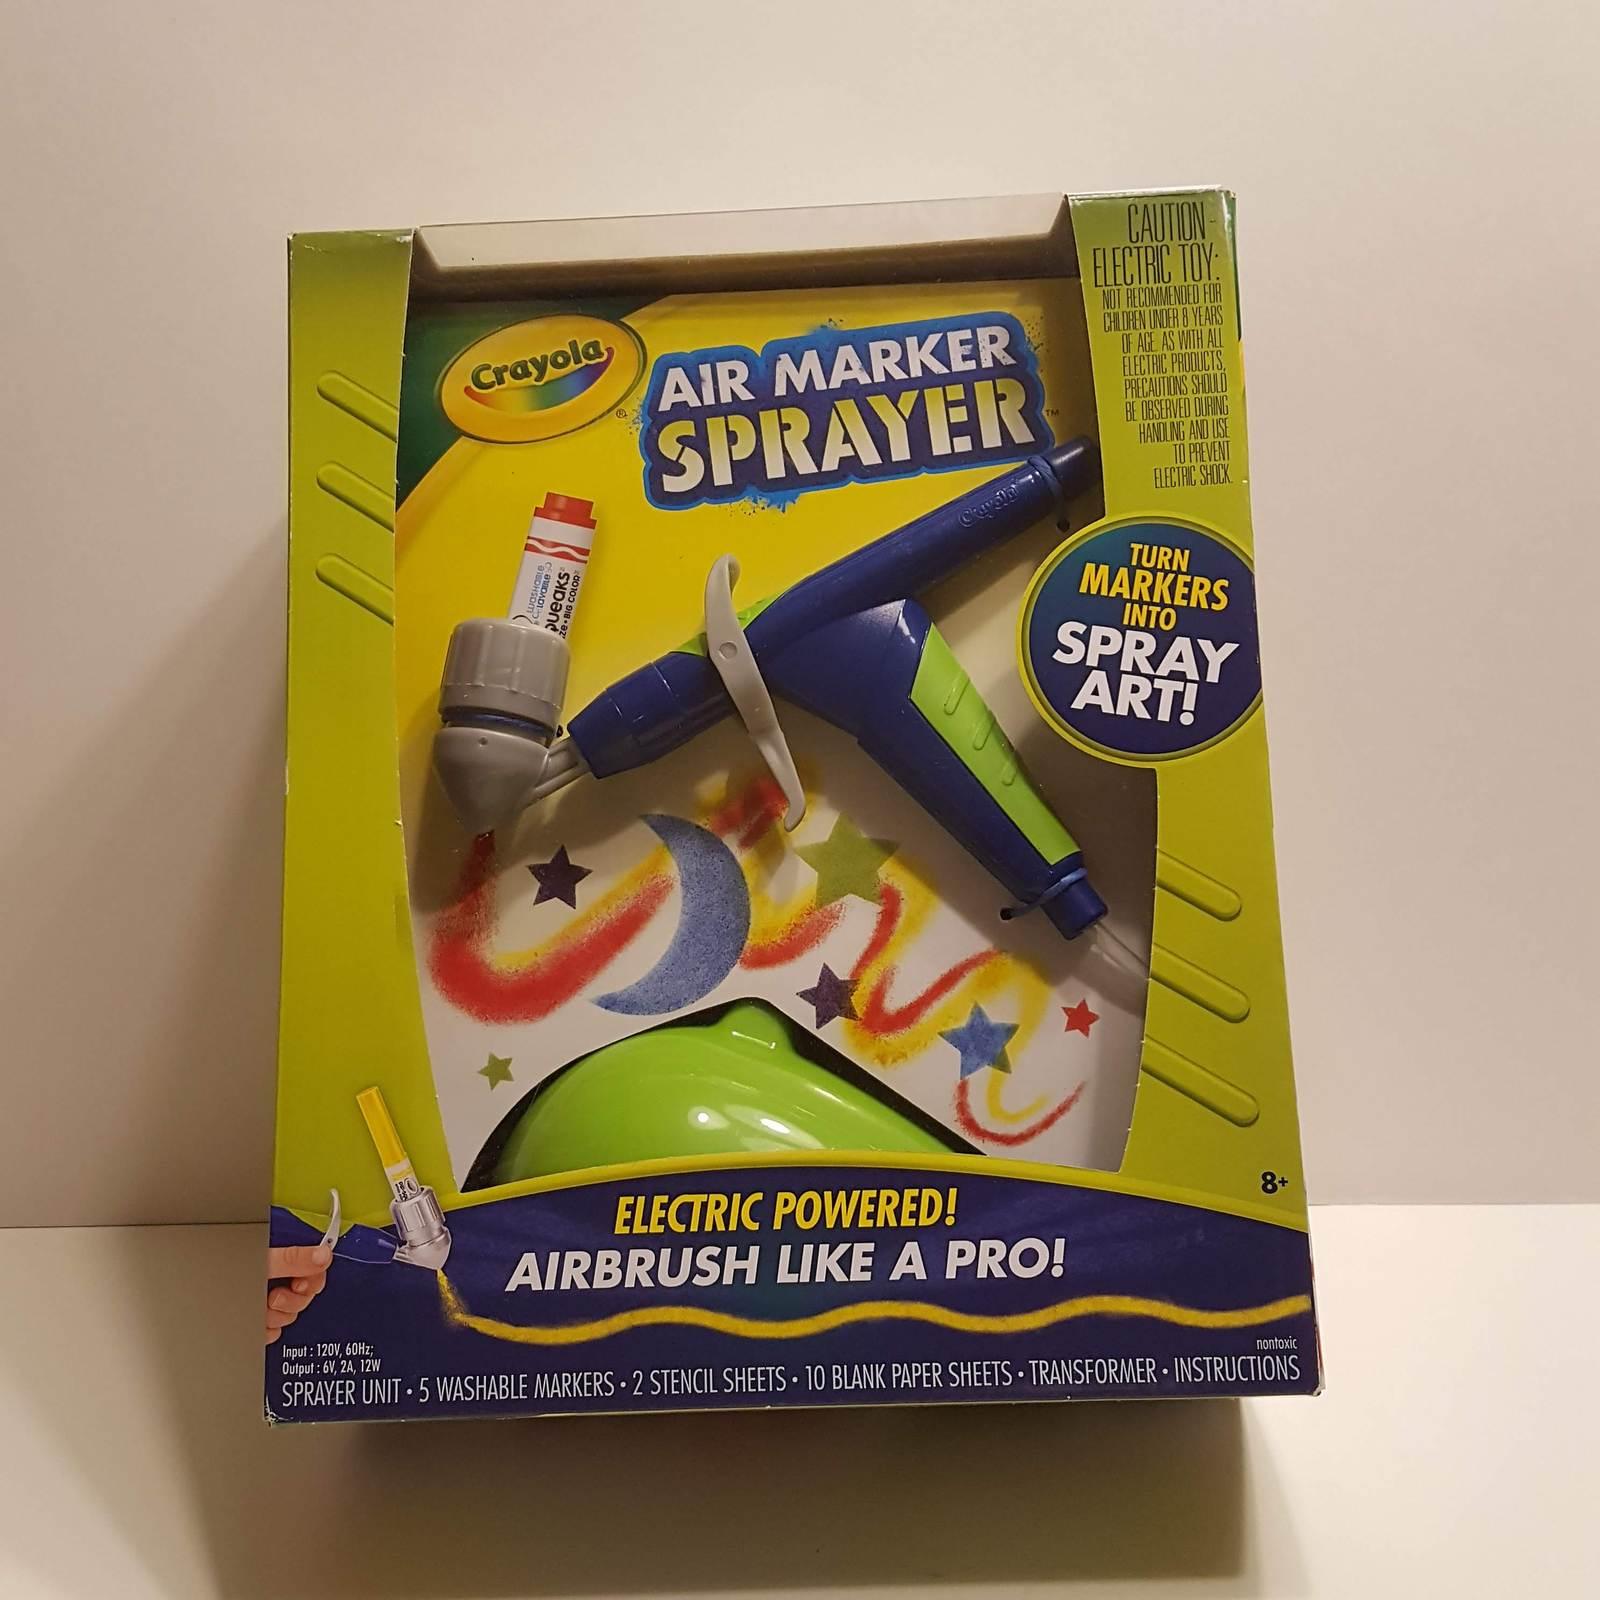 Crayola Air Marker Sprayer Set Airbrush And 50 Similar Items